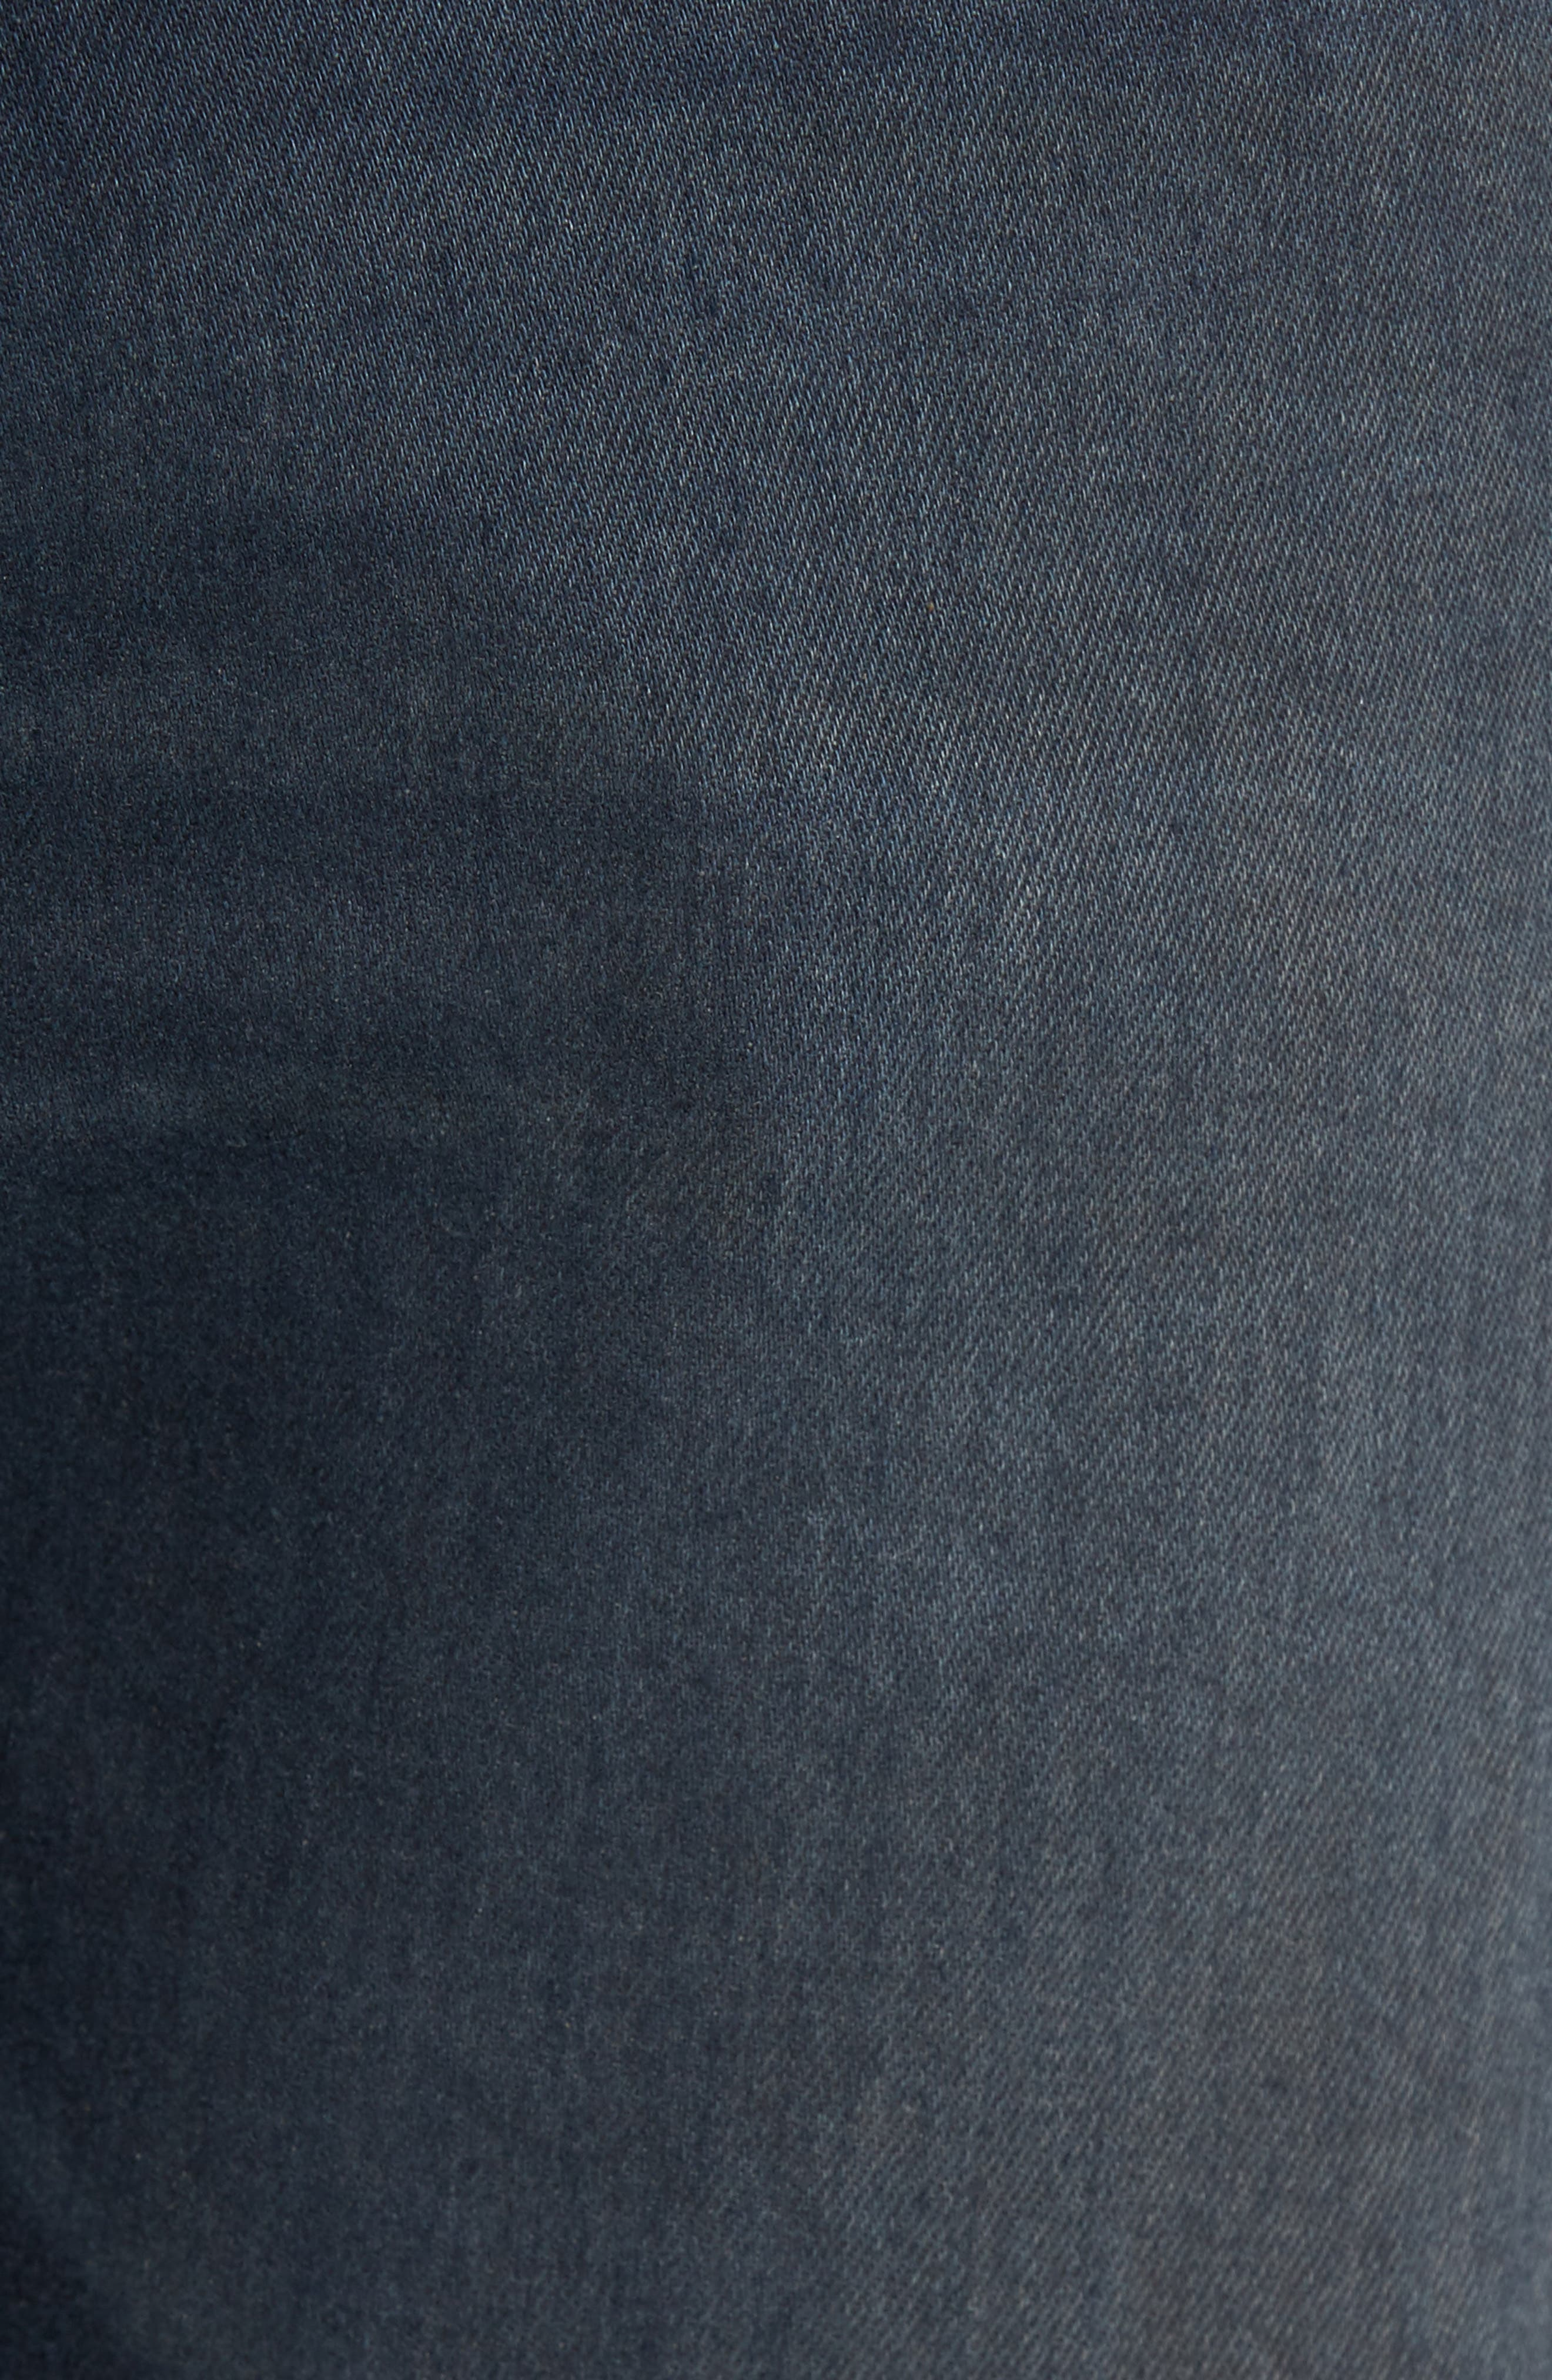 Ives Straight Fit Jeans,                             Alternate thumbnail 5, color,                             Blue Smolder